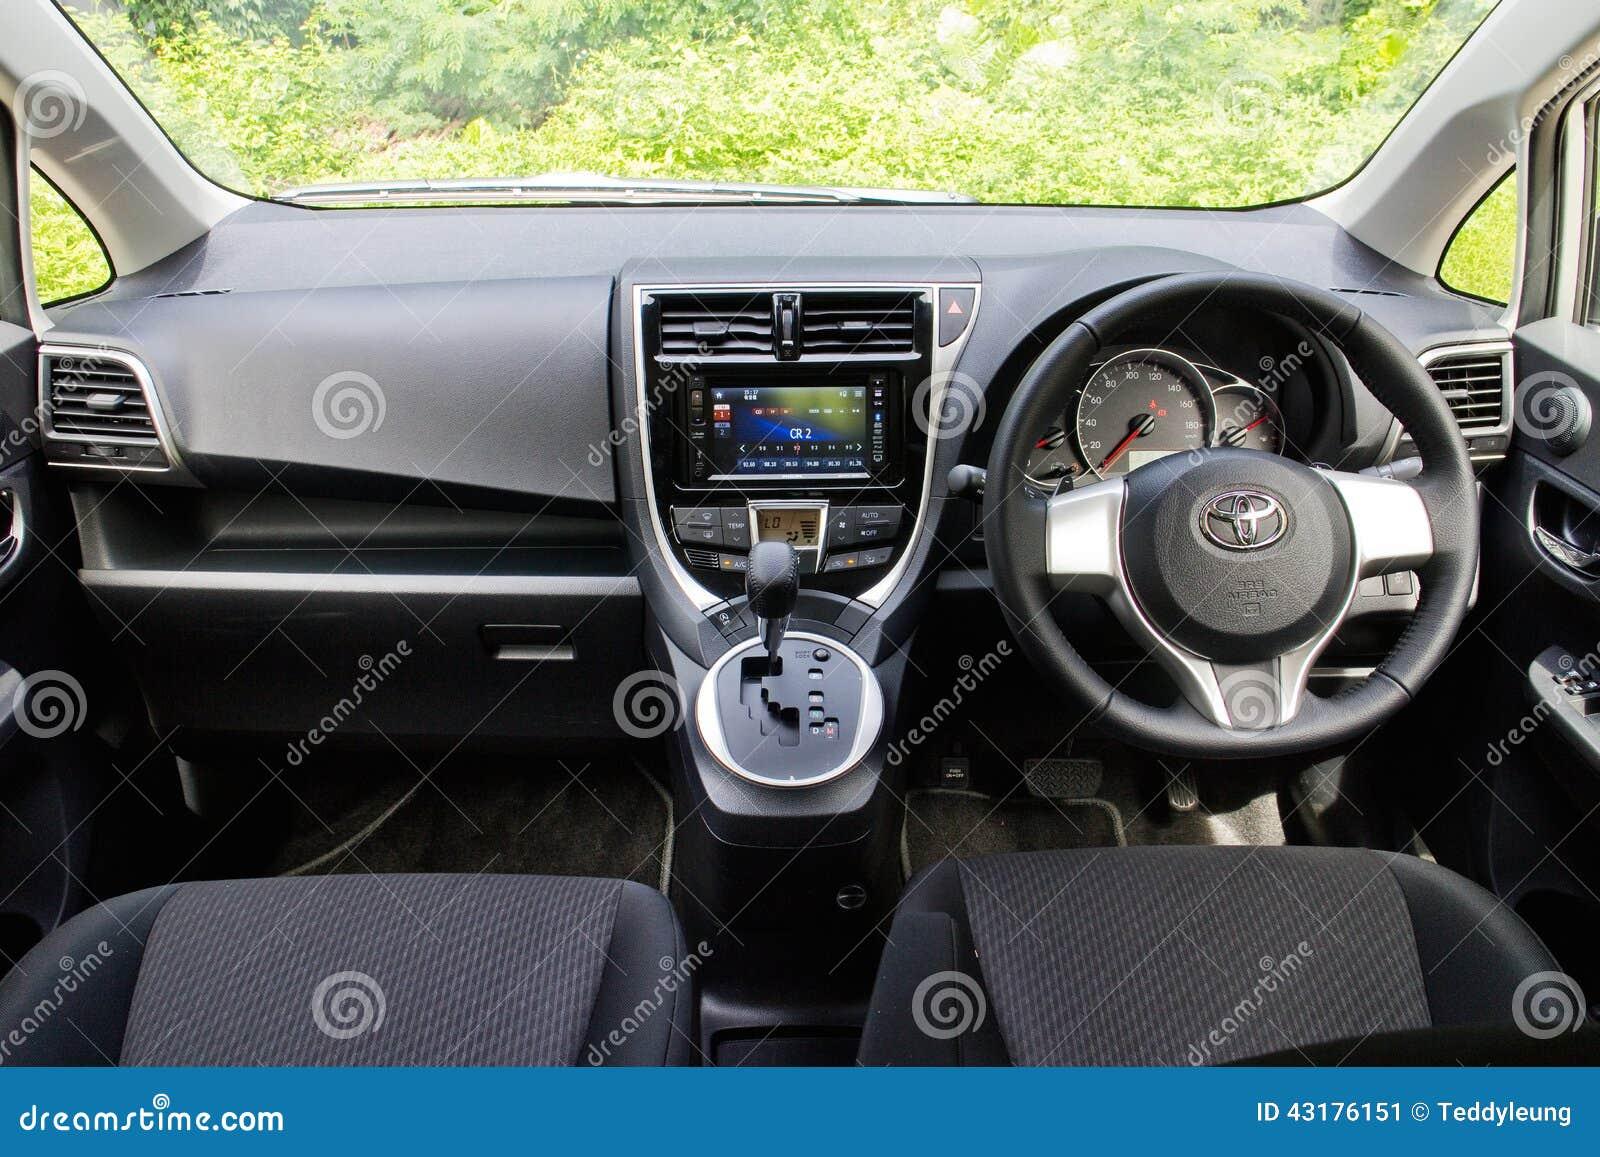 car hatchback interior parts engine seats dashboard drawing blueprint outlines not converted to. Black Bedroom Furniture Sets. Home Design Ideas